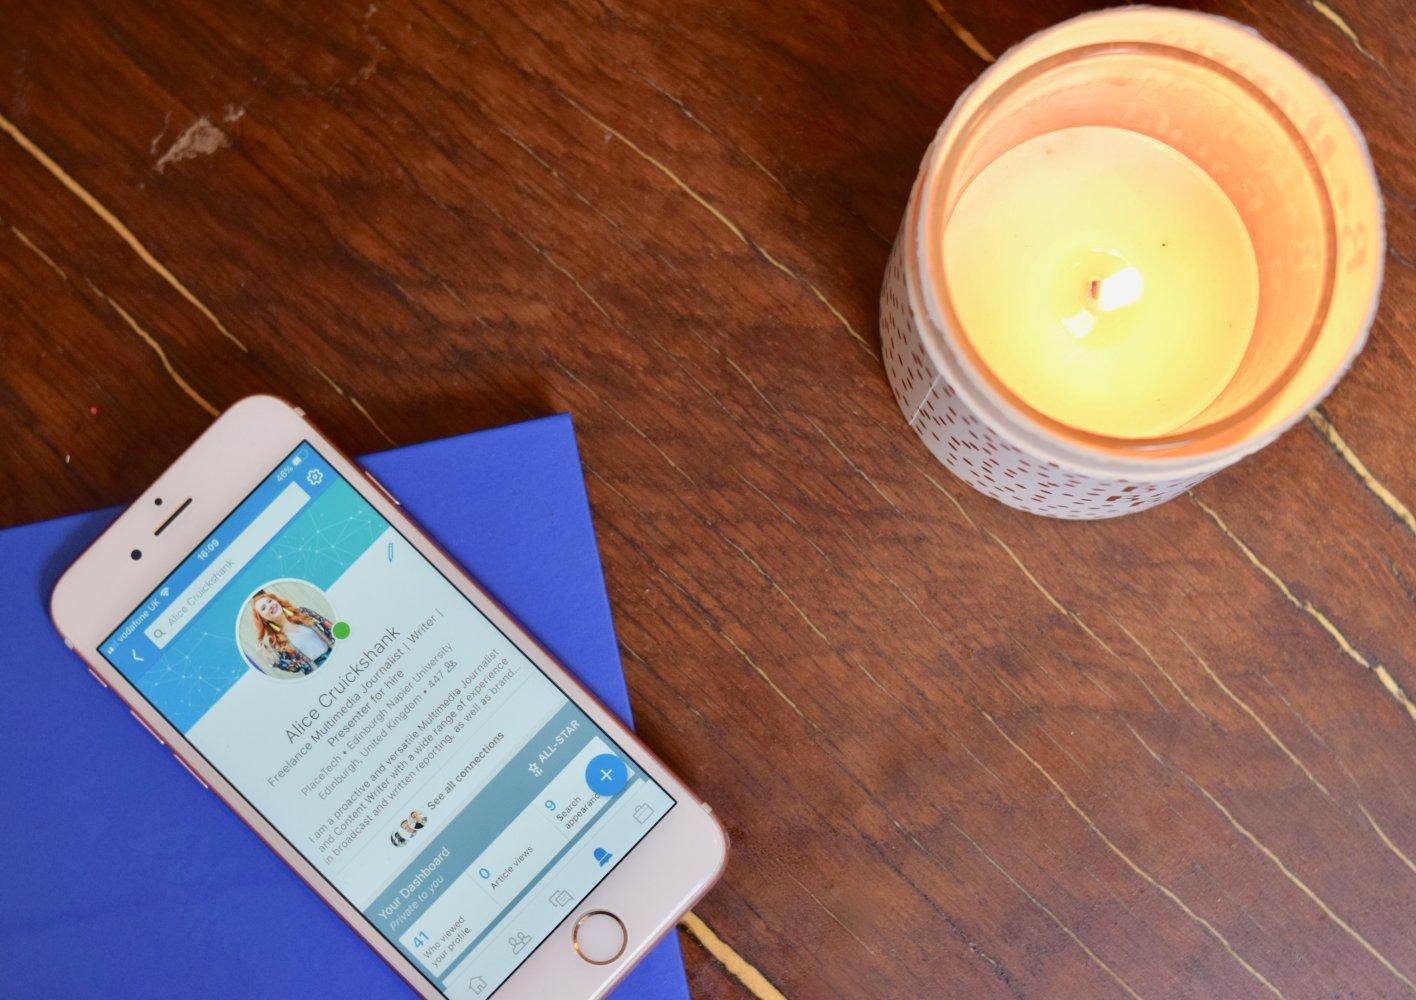 Twenty-Something City LinkedIn tips from Graduate Goal on iPhone